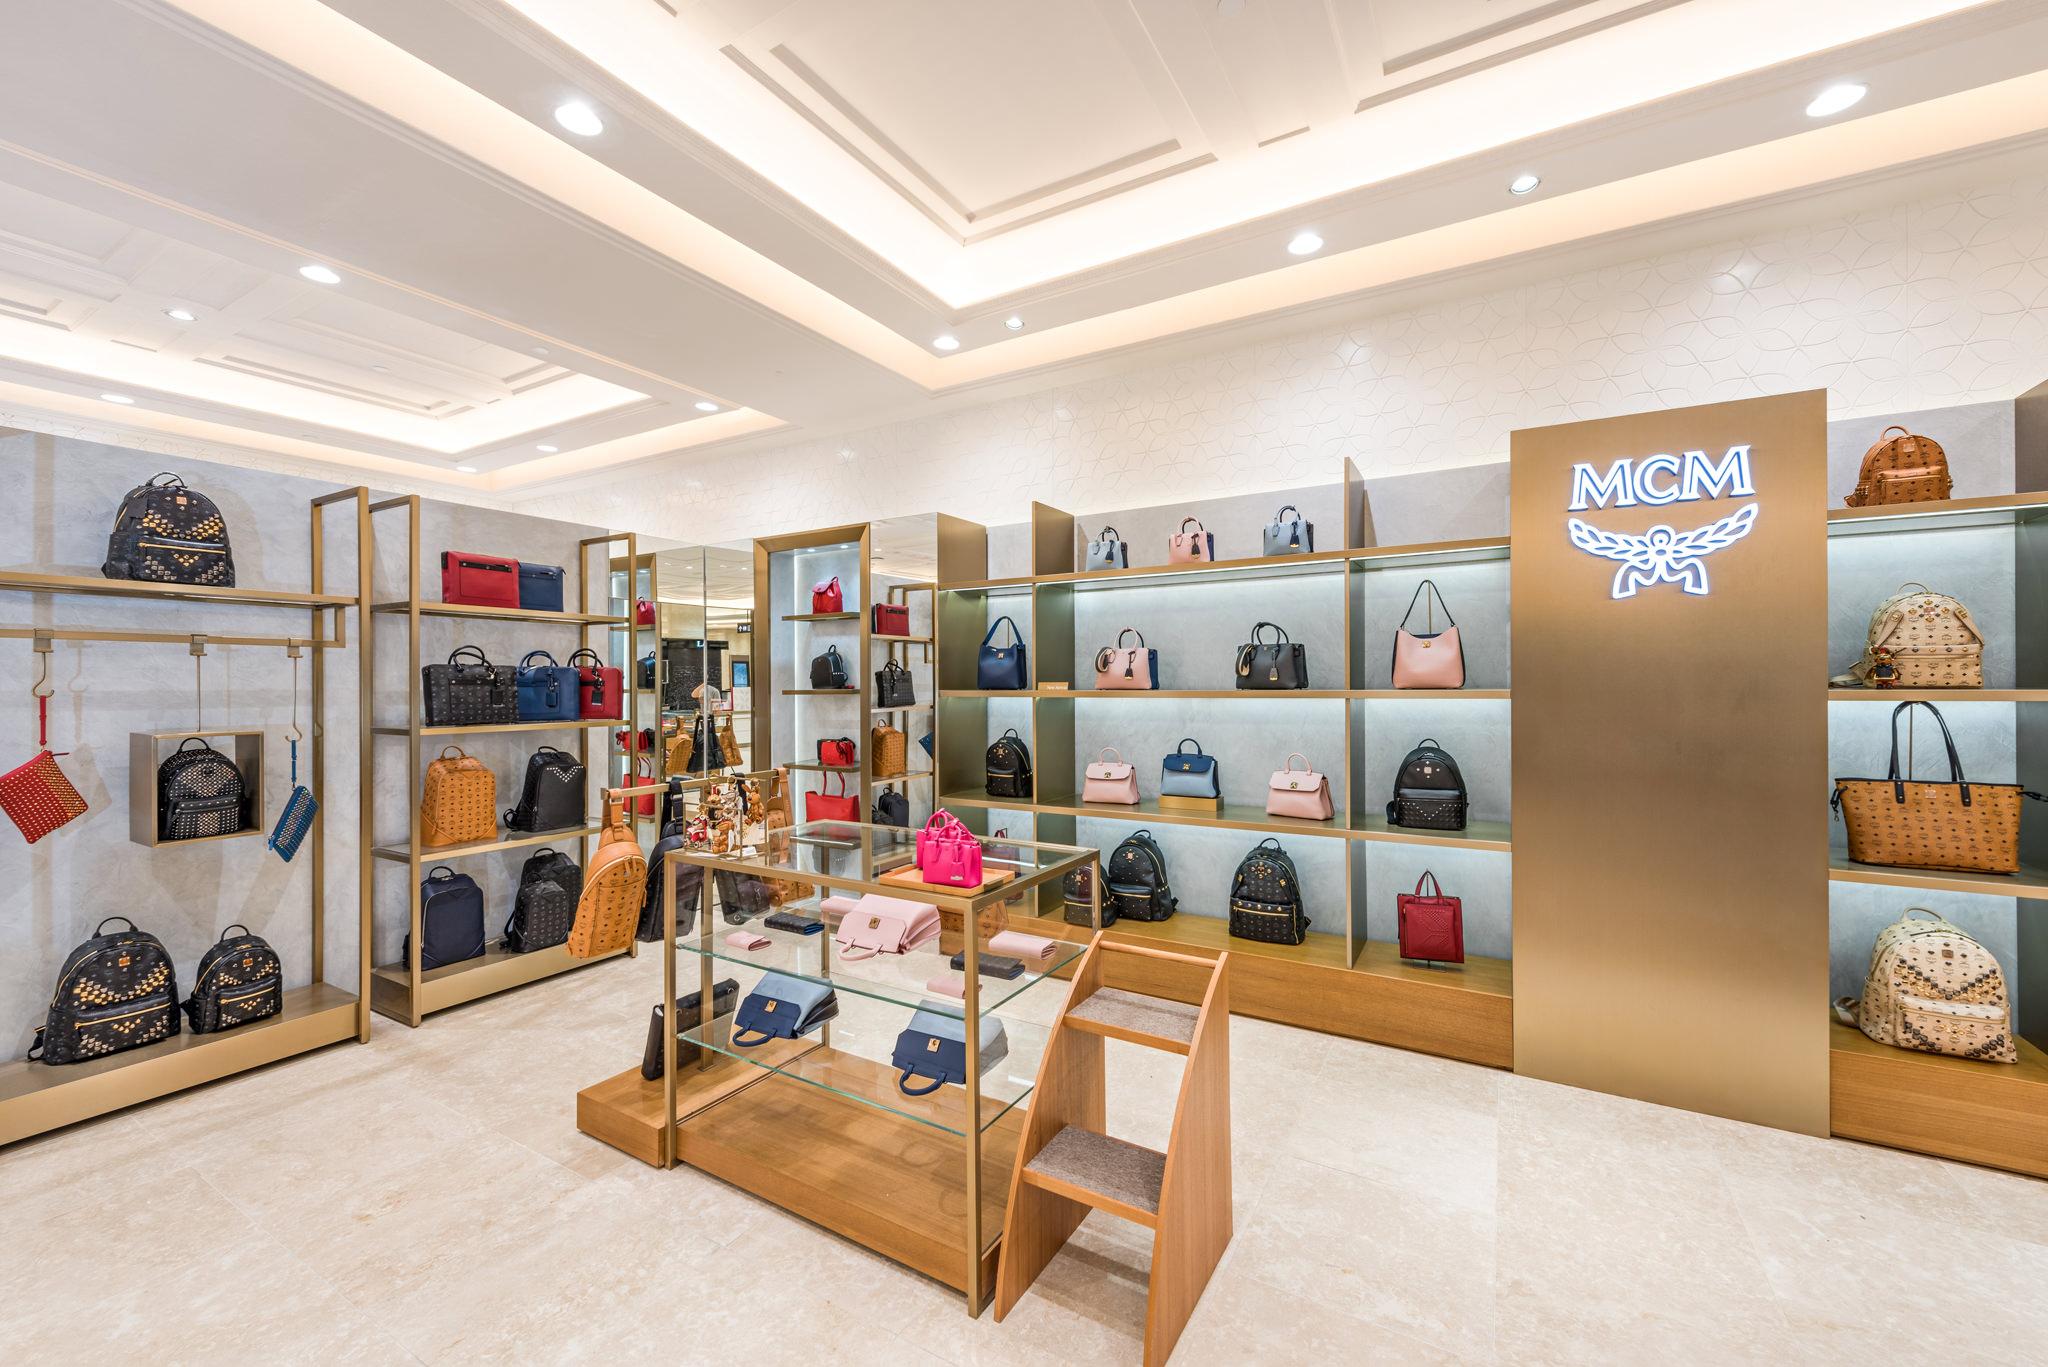 20160729 - MCM - HCM - Commercial - Interior - Store - Retouch 0006.jpg